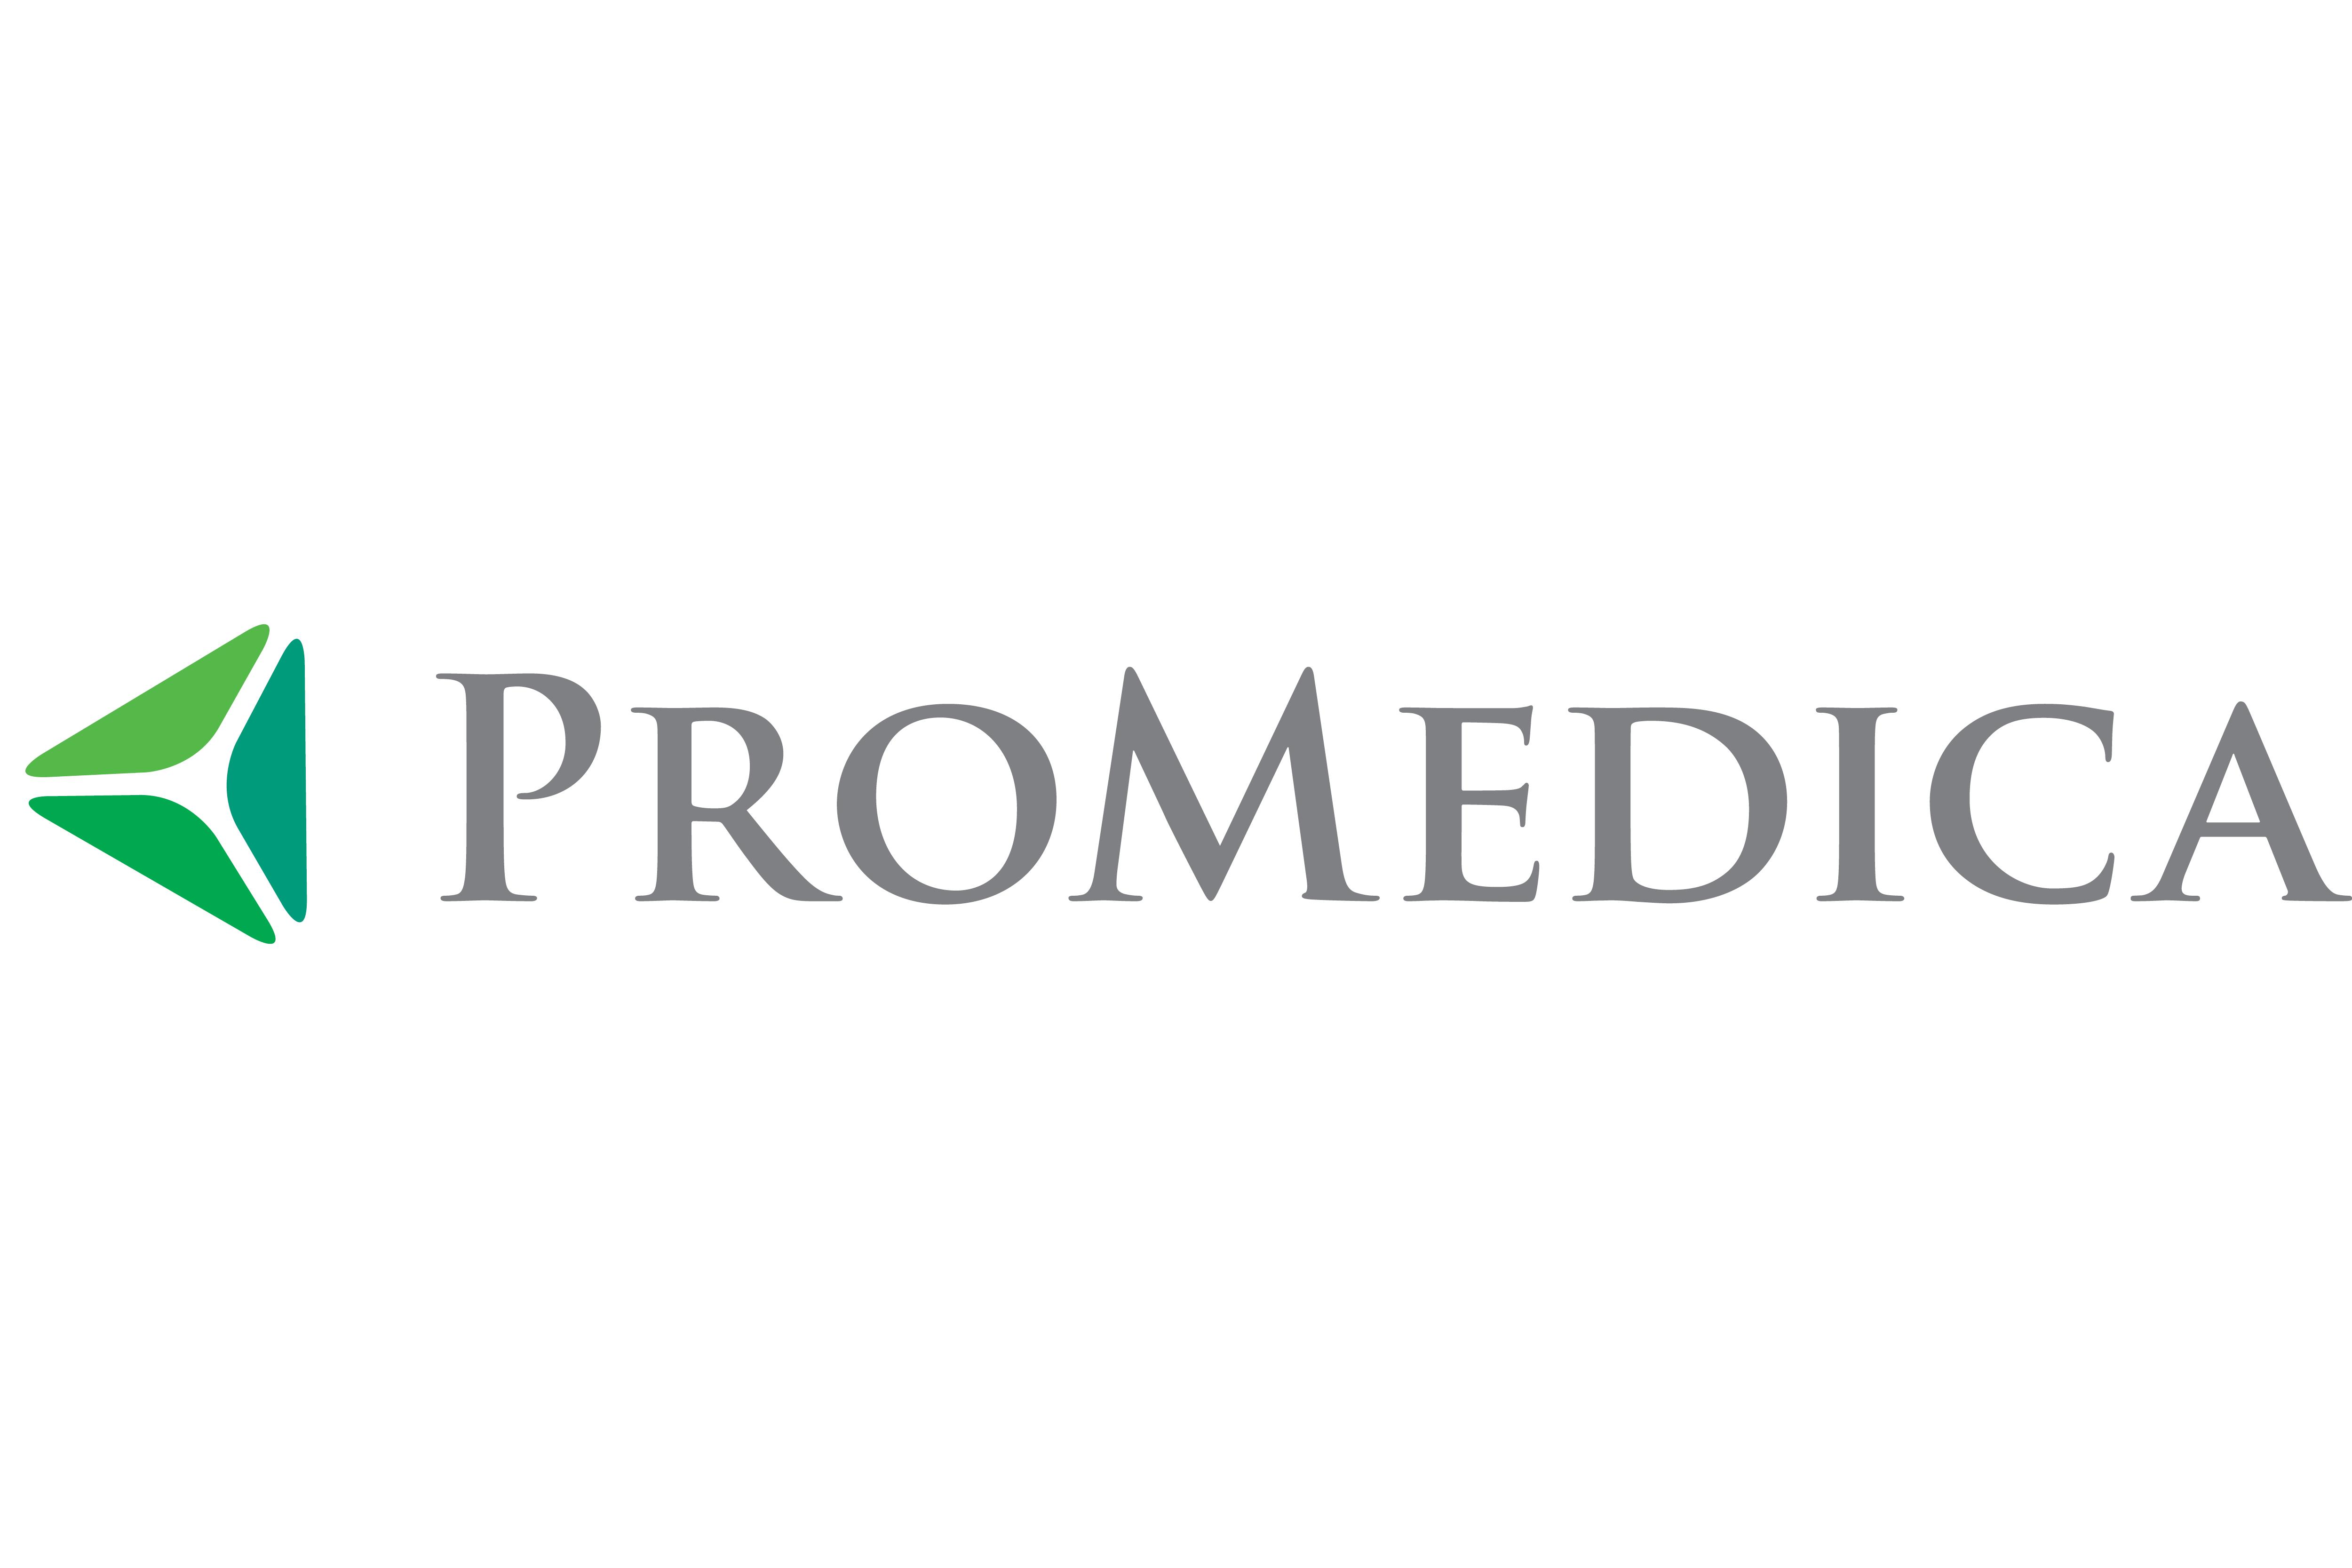 Promedica_400x600